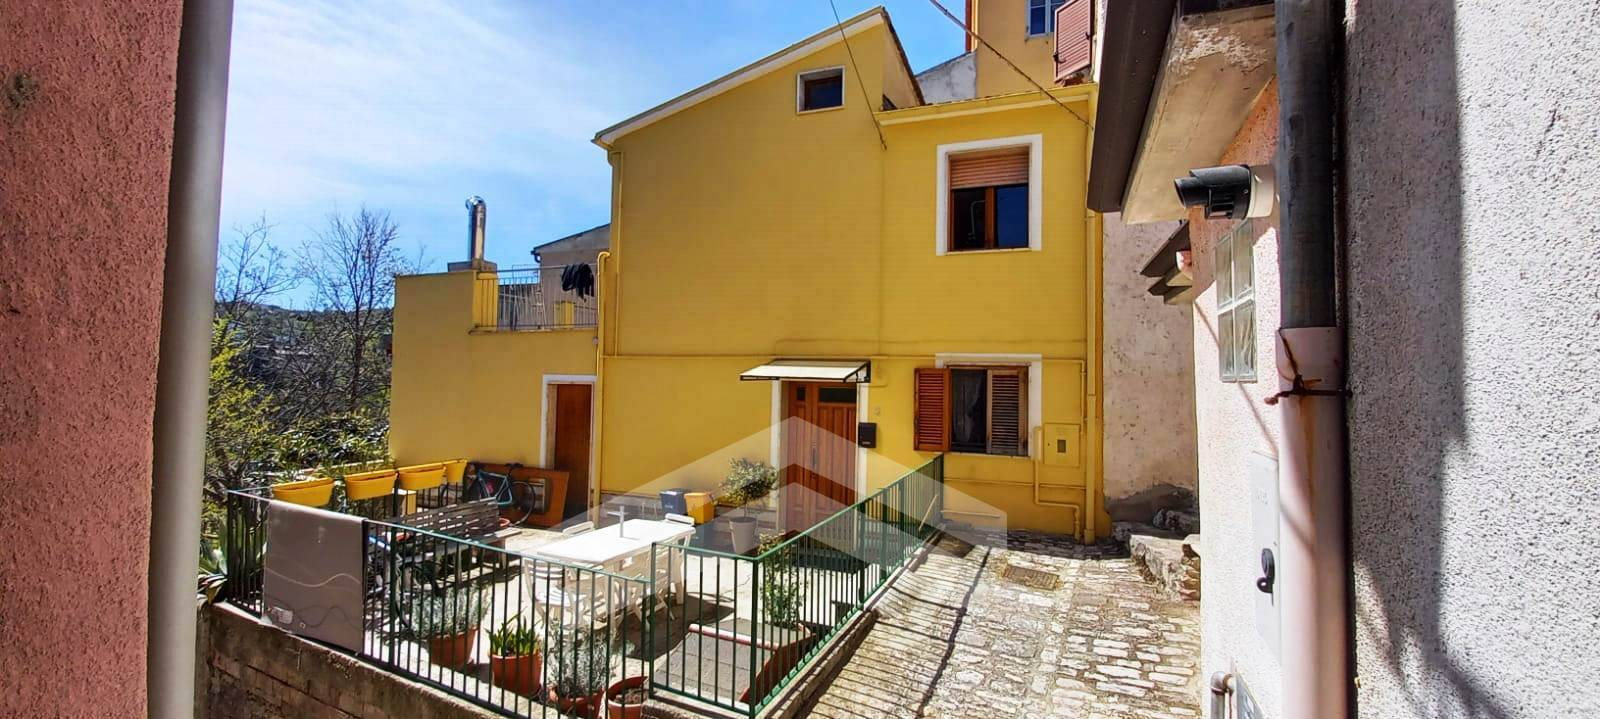 Casa indipendente in vendita a Mirabello Sannitico (CB)